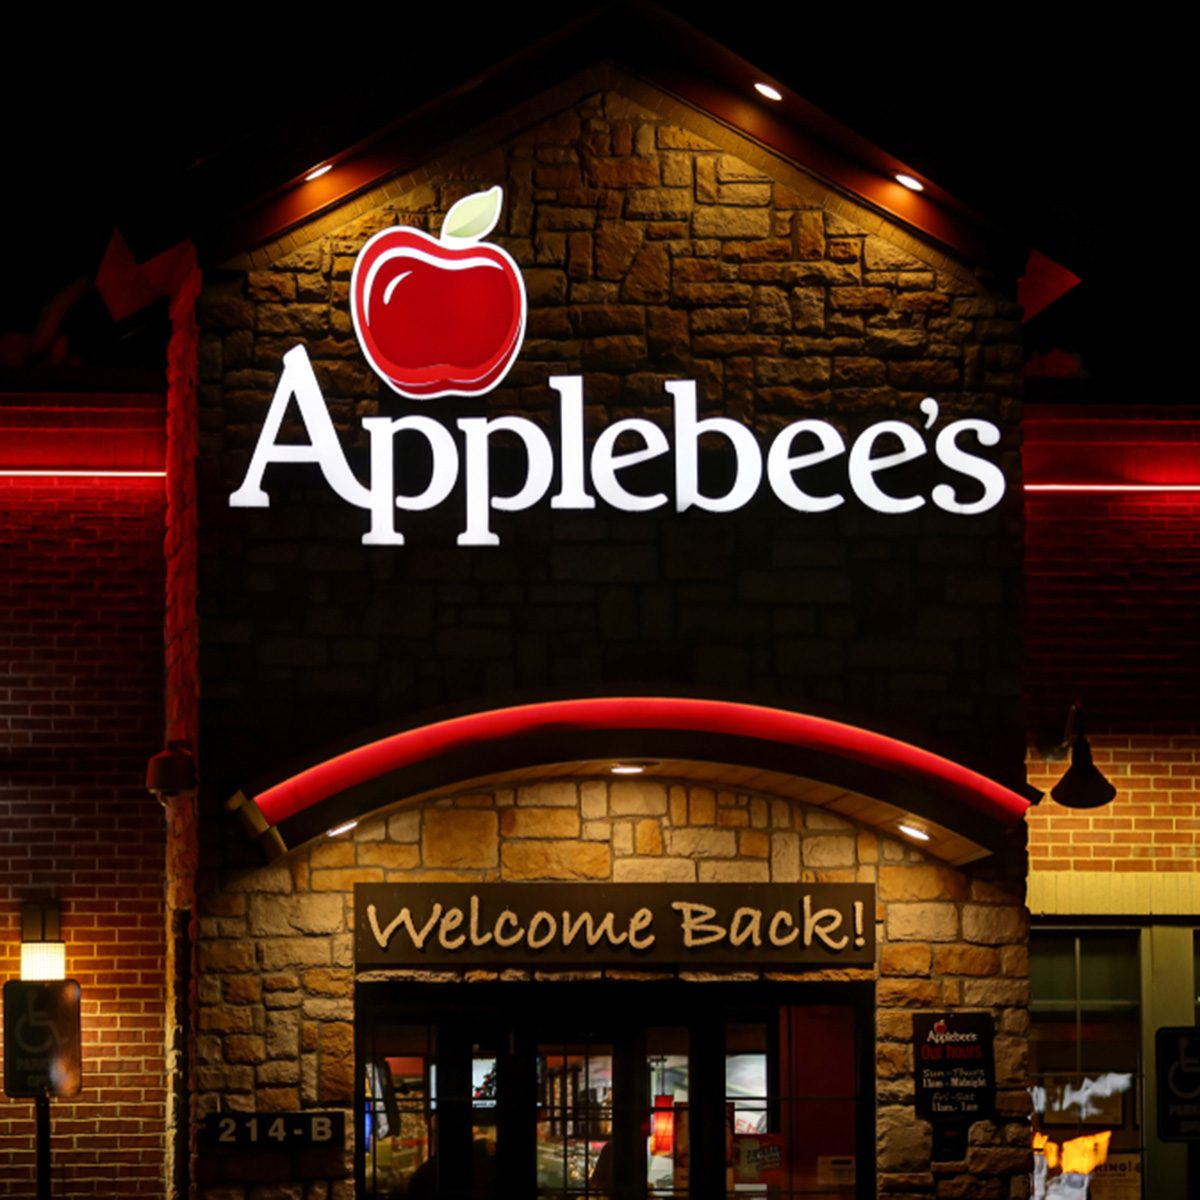 Applebee's casual dining family restaurant logo sign